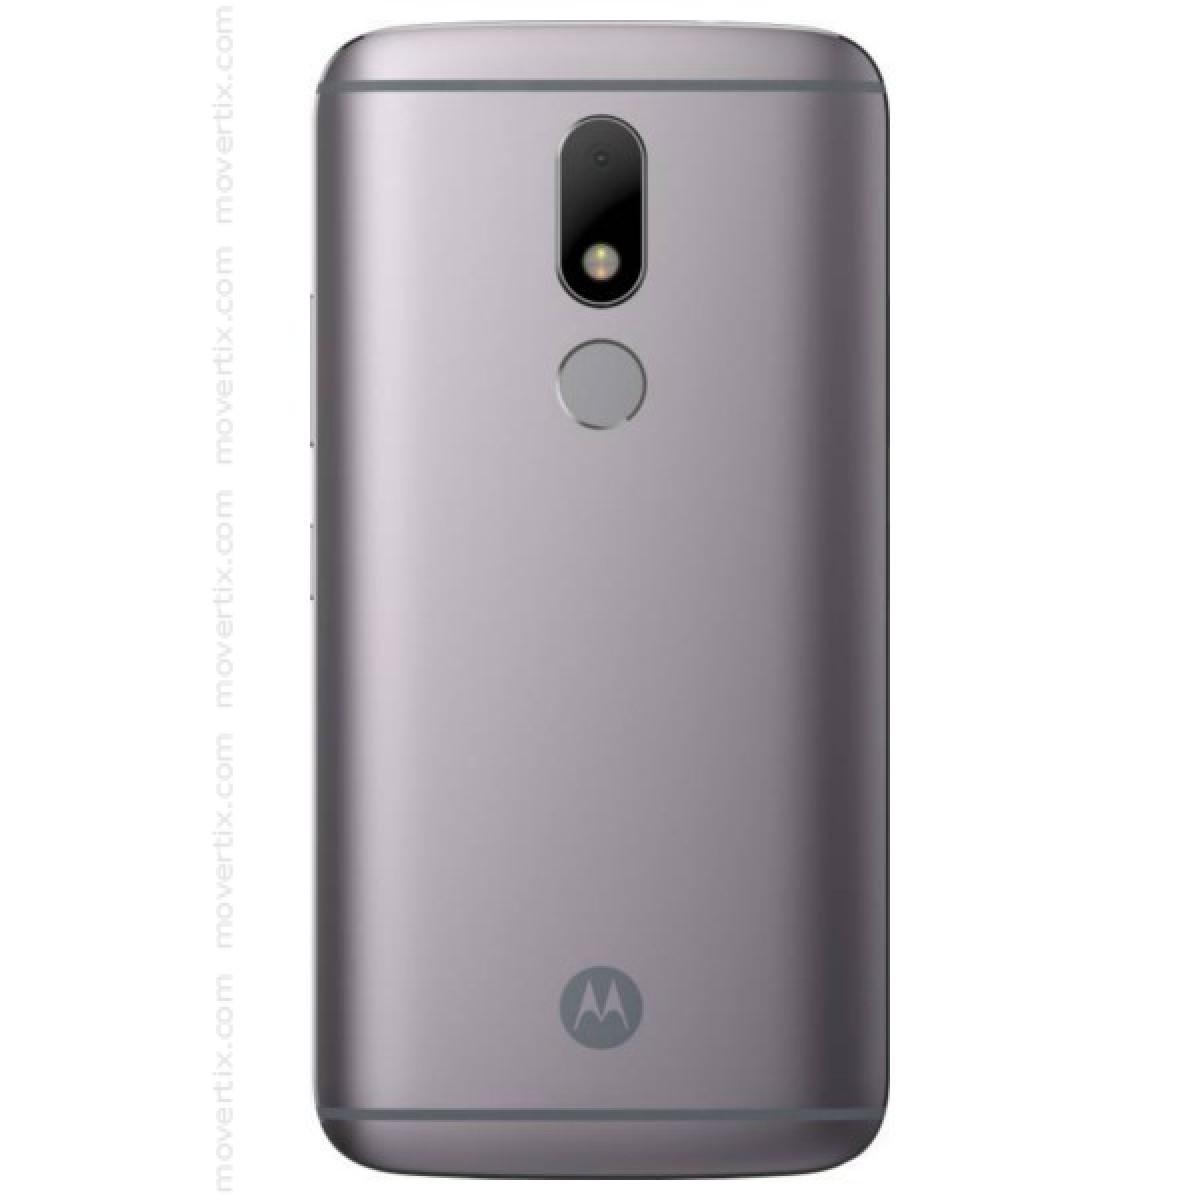 Motorola Moto M Dual SIM Grey (XT1663)